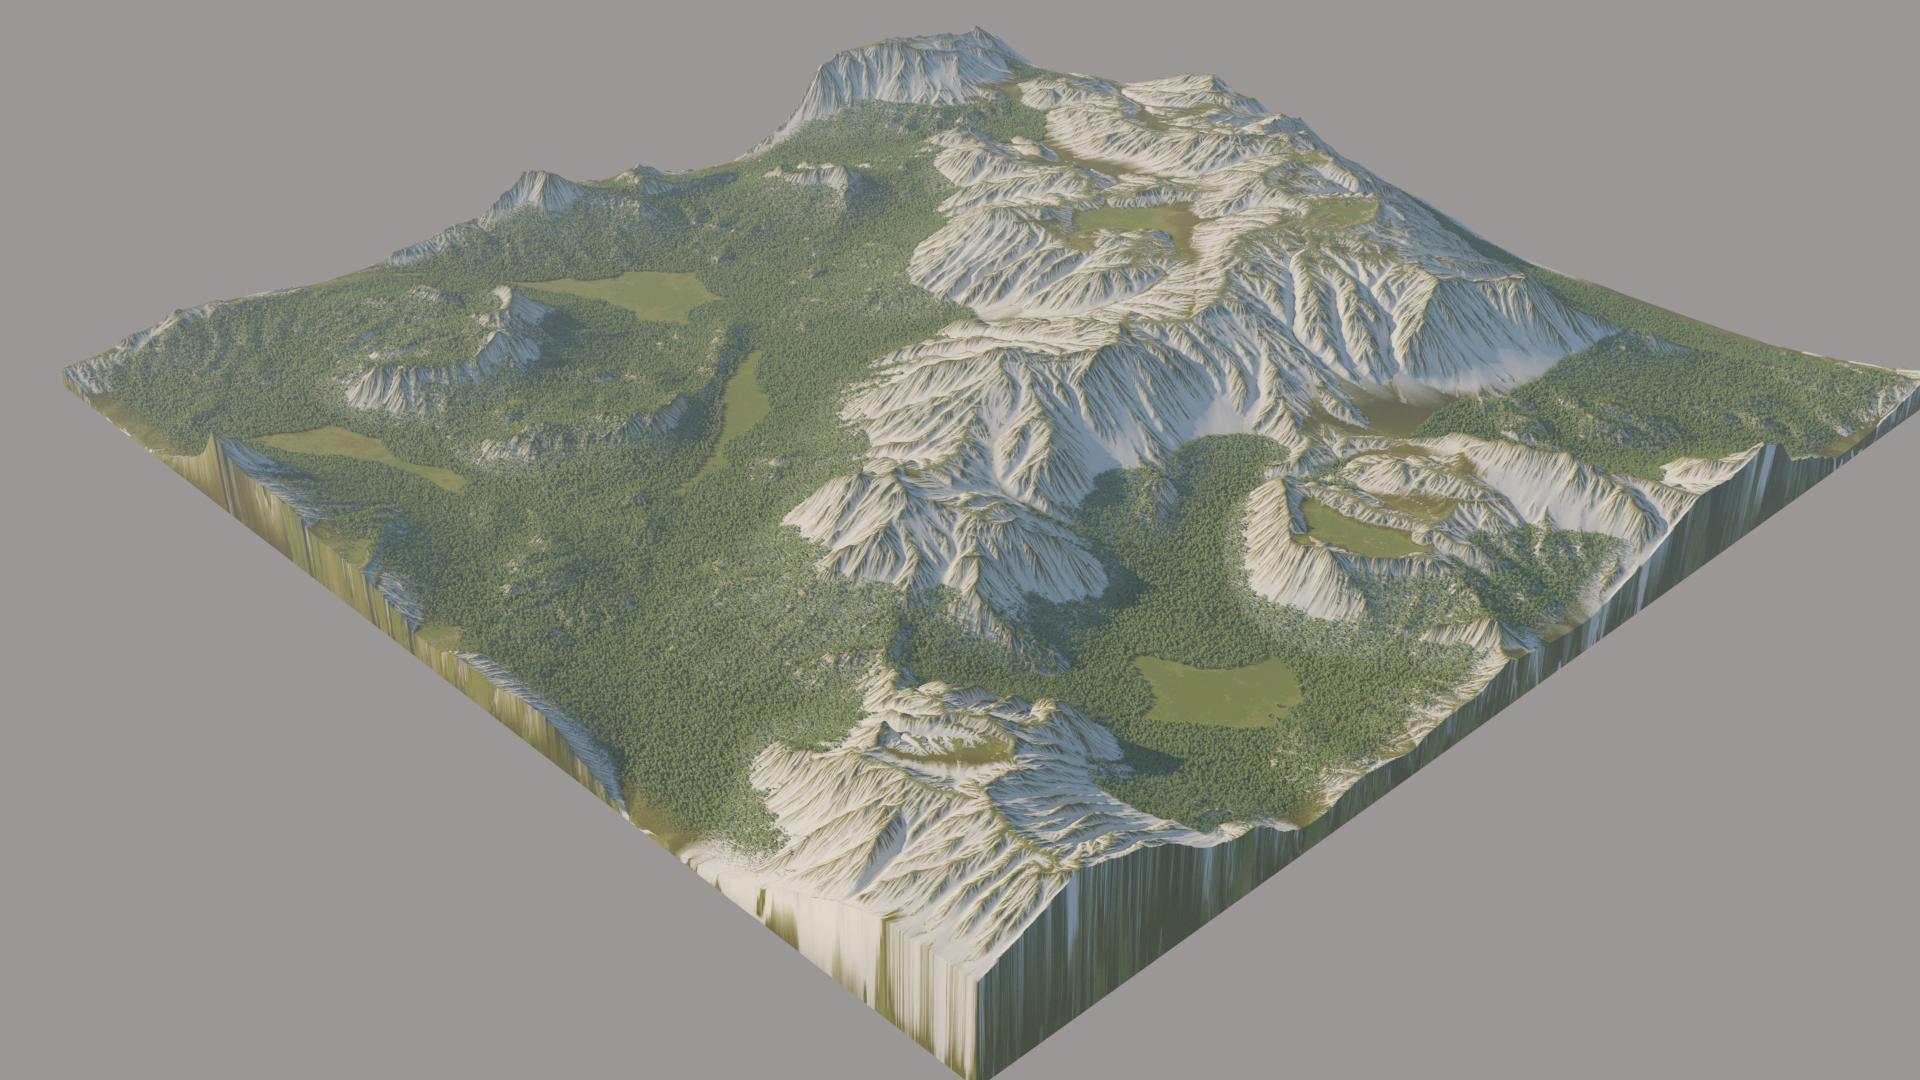 Jungle_MountainForest_03_